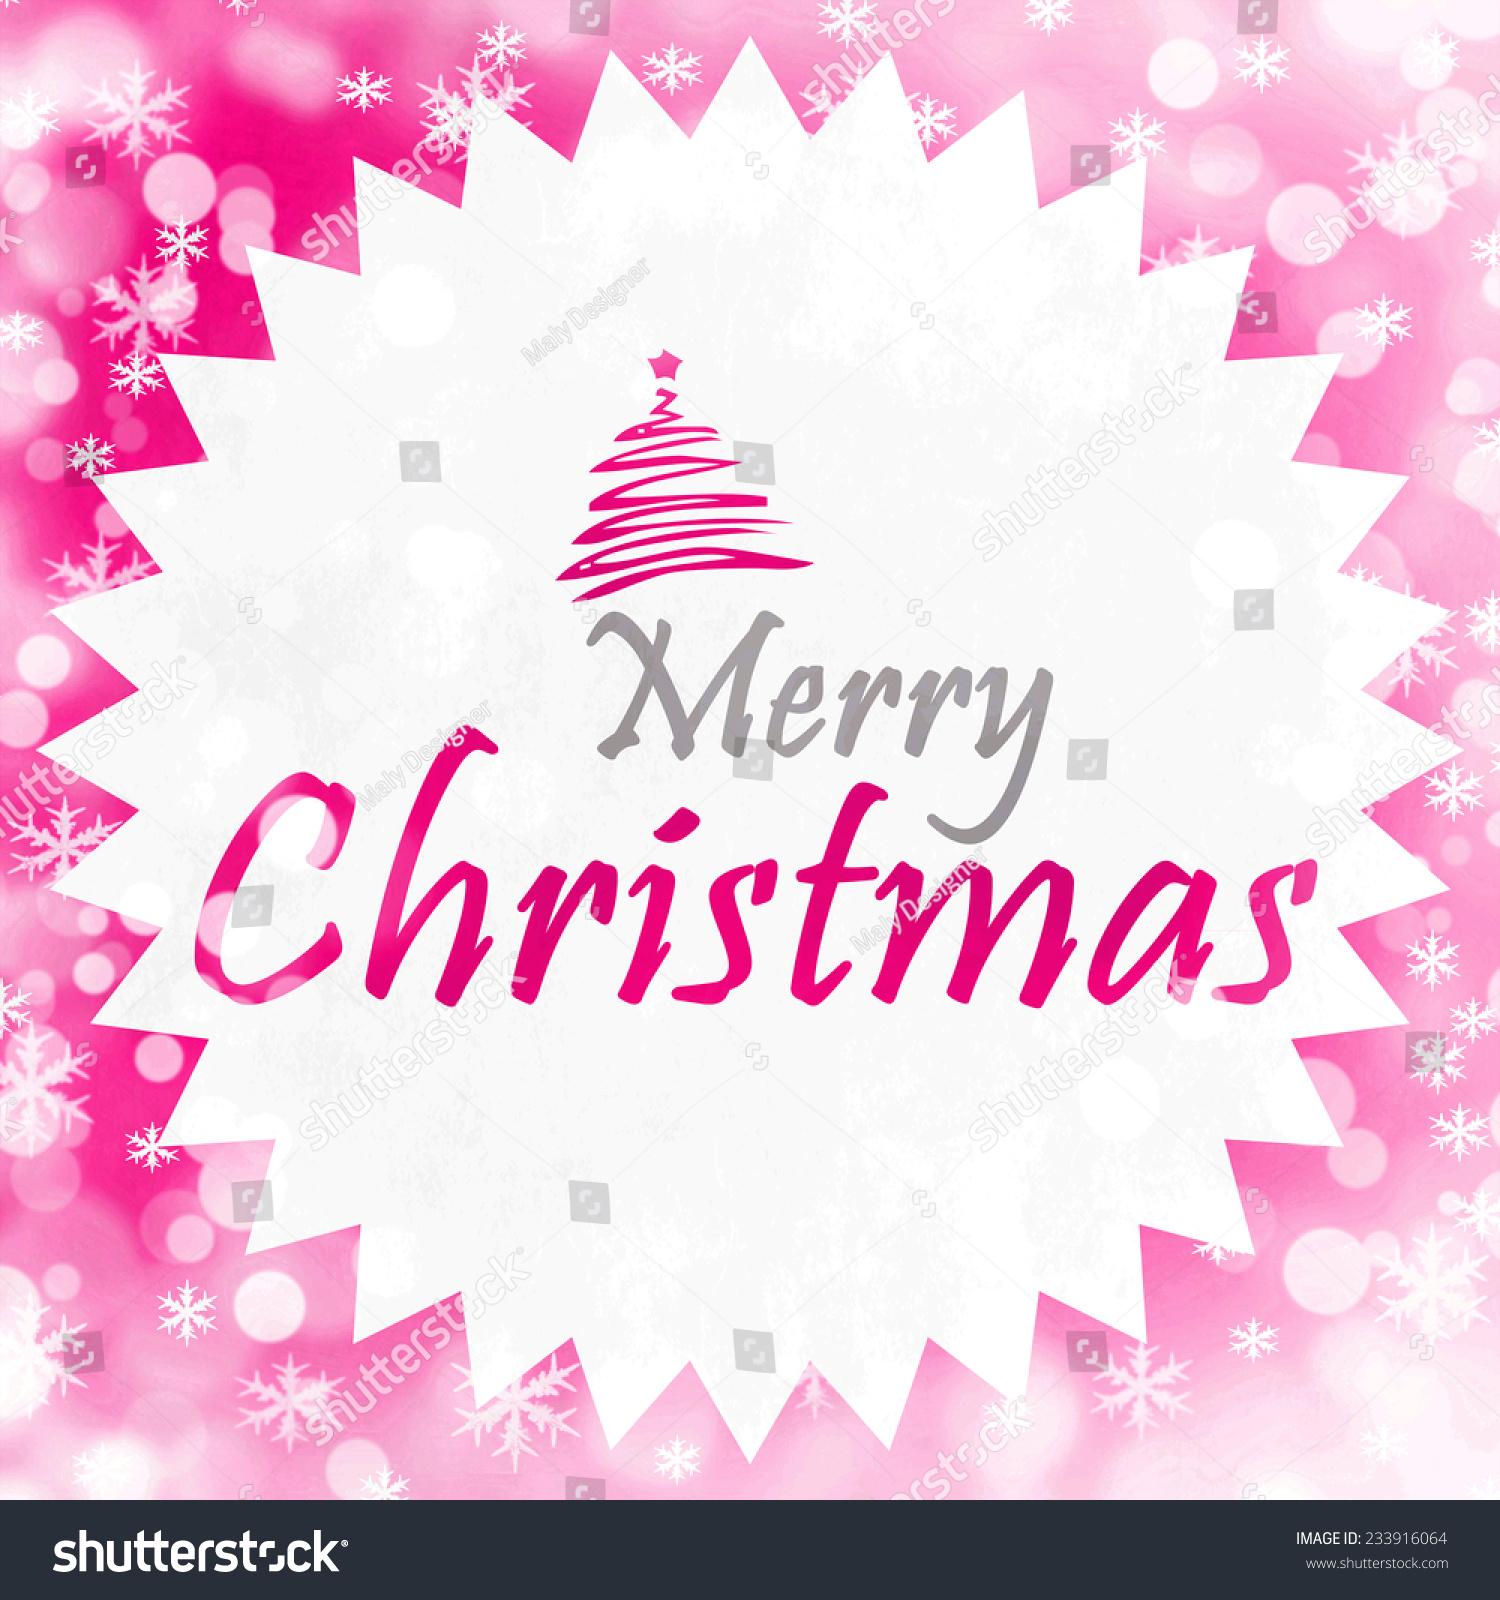 Merry christmas season greetings quote stock illustration 233916064 merry christmas season greetings quote m4hsunfo